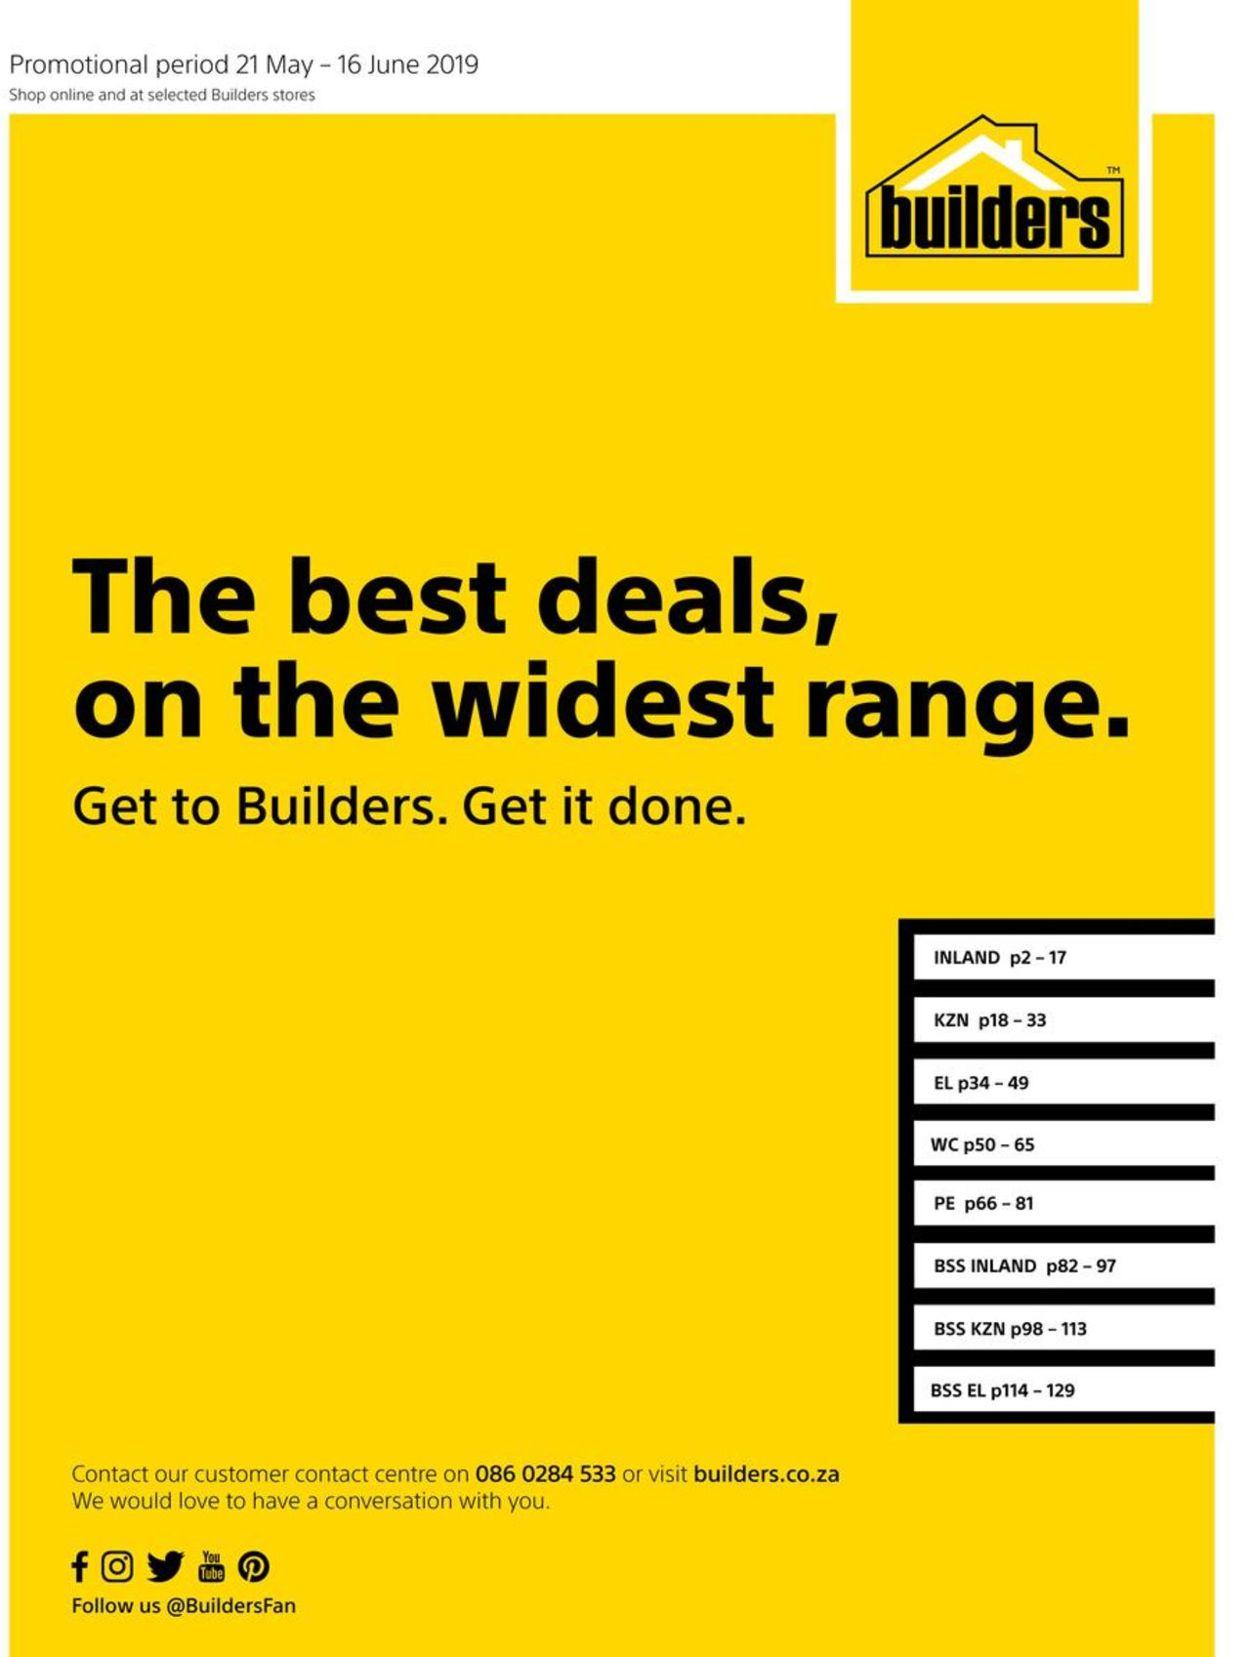 Builders Warehouse Catalogue - 2019/05/21-2019/06/16